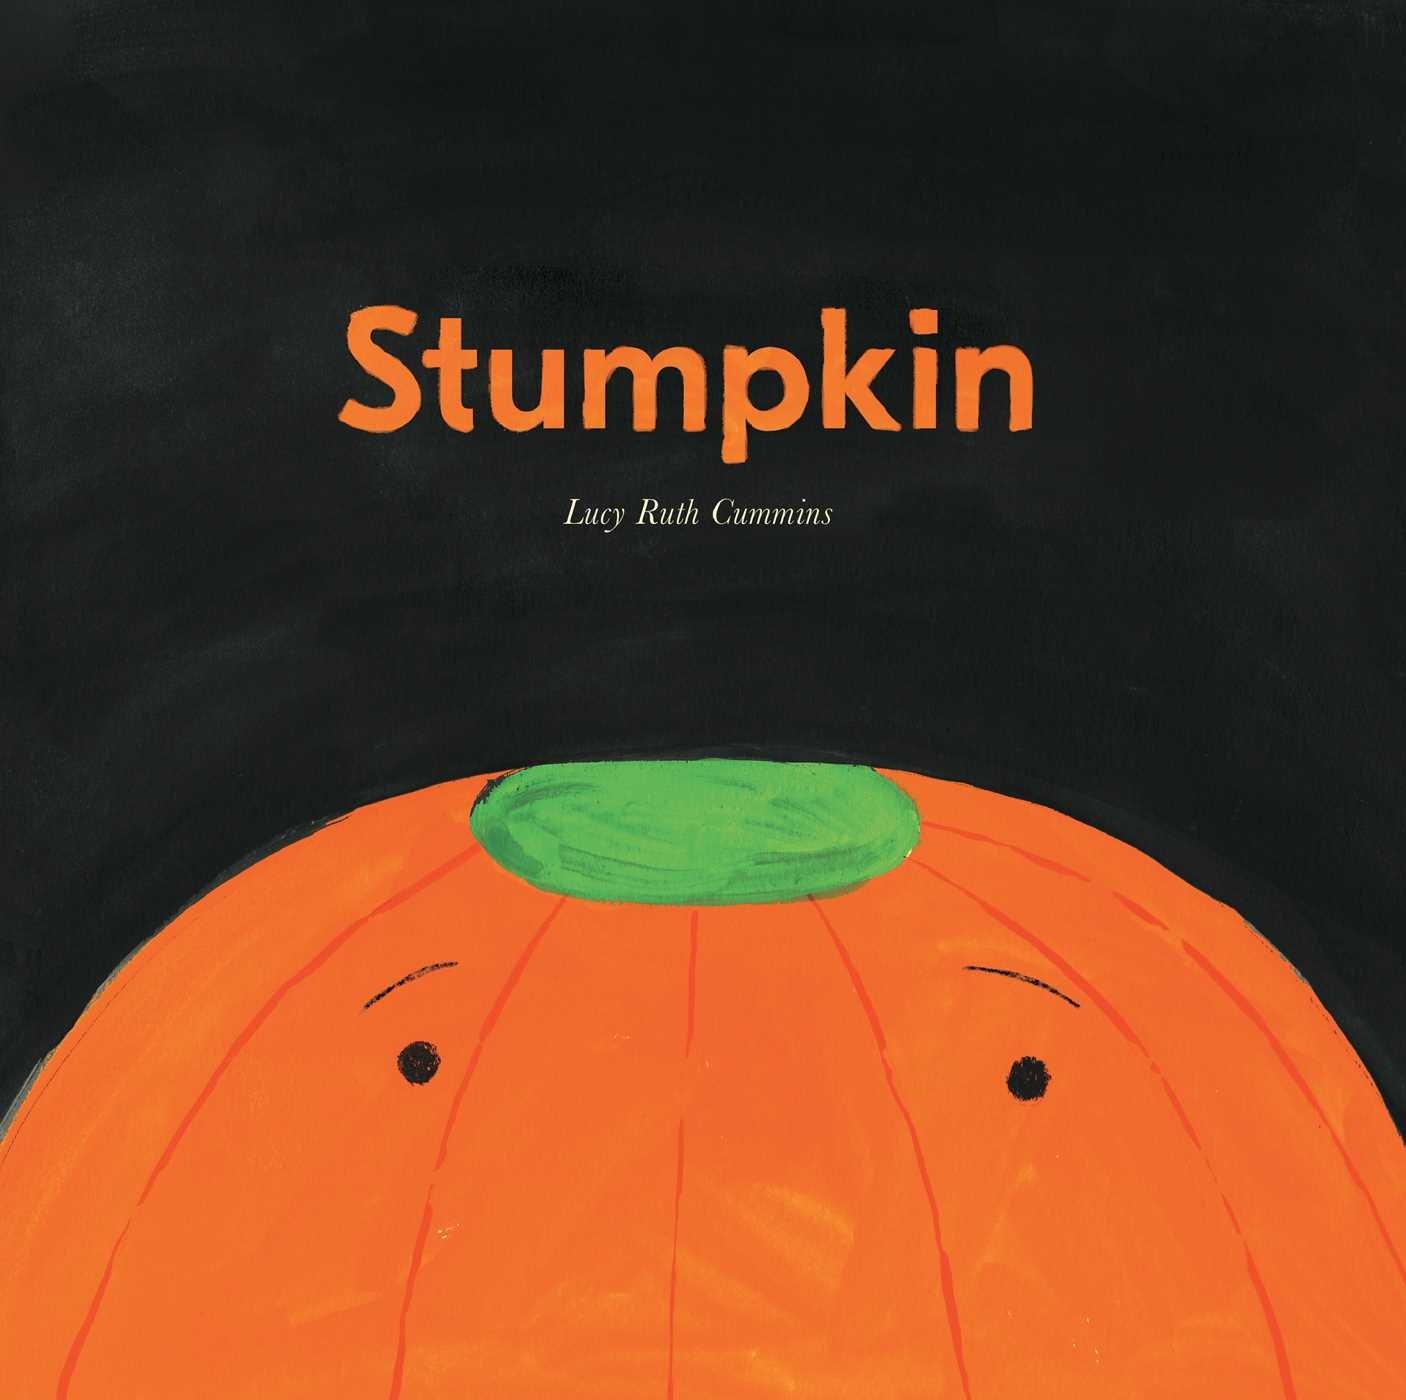 Image result for stumpkin amazon